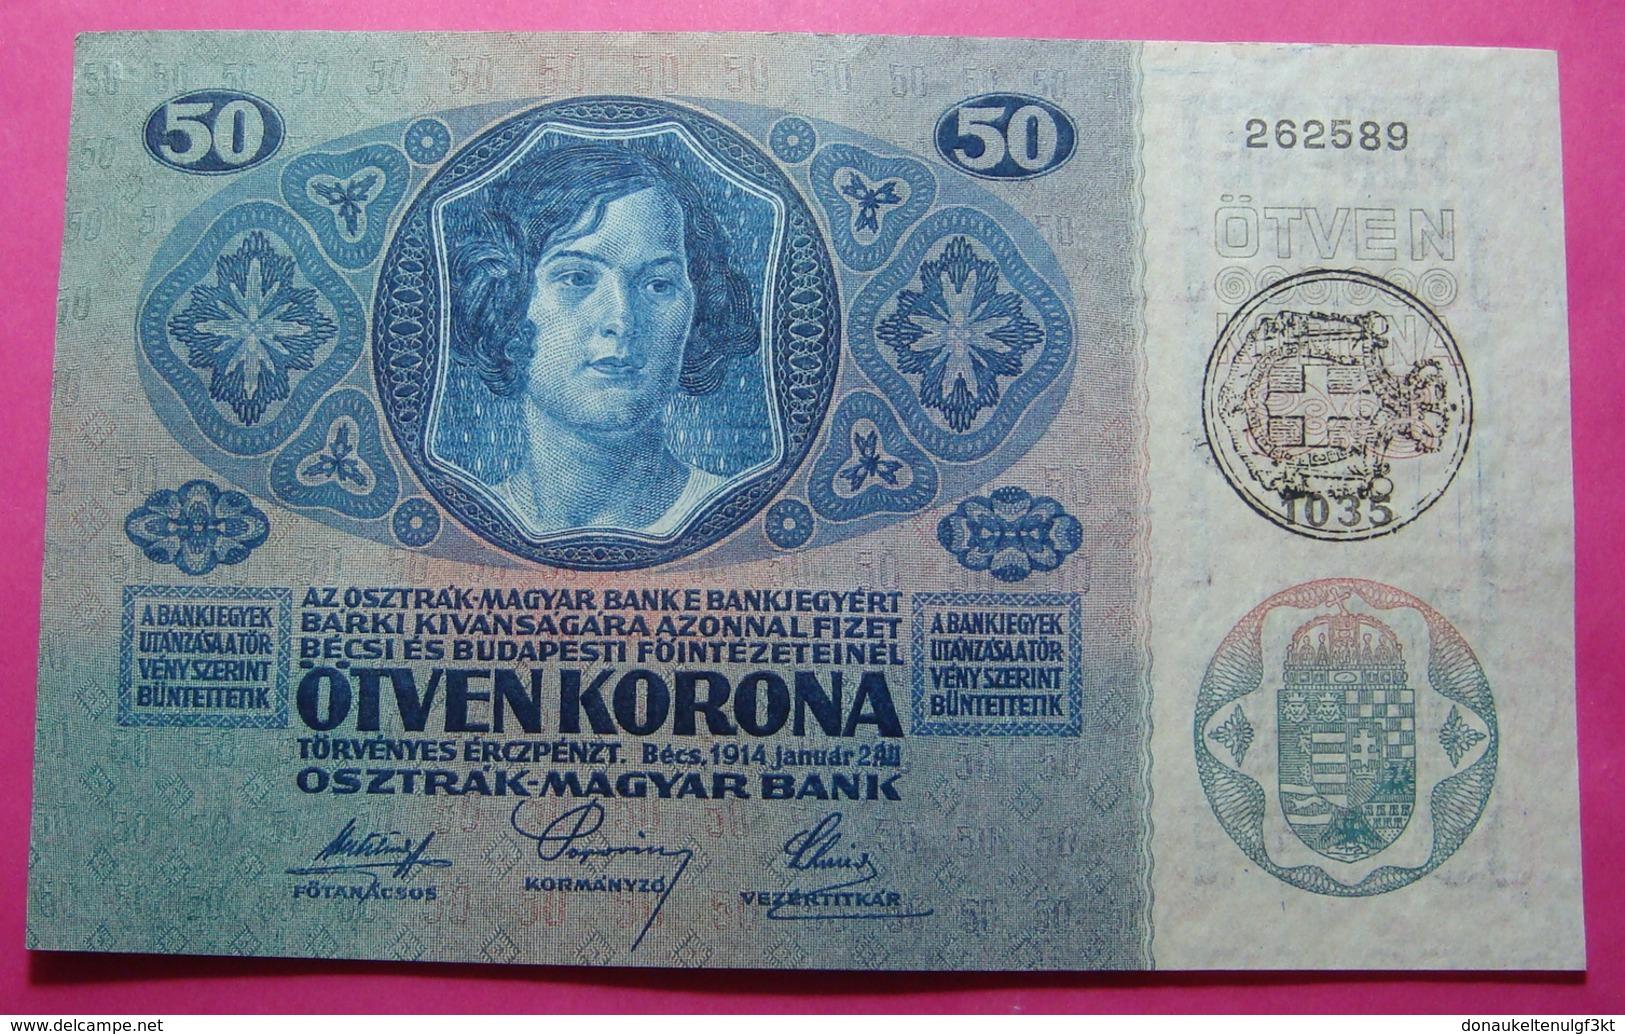 ITALIA - CROATIA - AUSTRIA CITY OF FIUME RIJEKA 50 KRONEN ND 1917-1919, WITH SEAL *SAVOY, D'ANNUNZIO* 262589 - Croatie